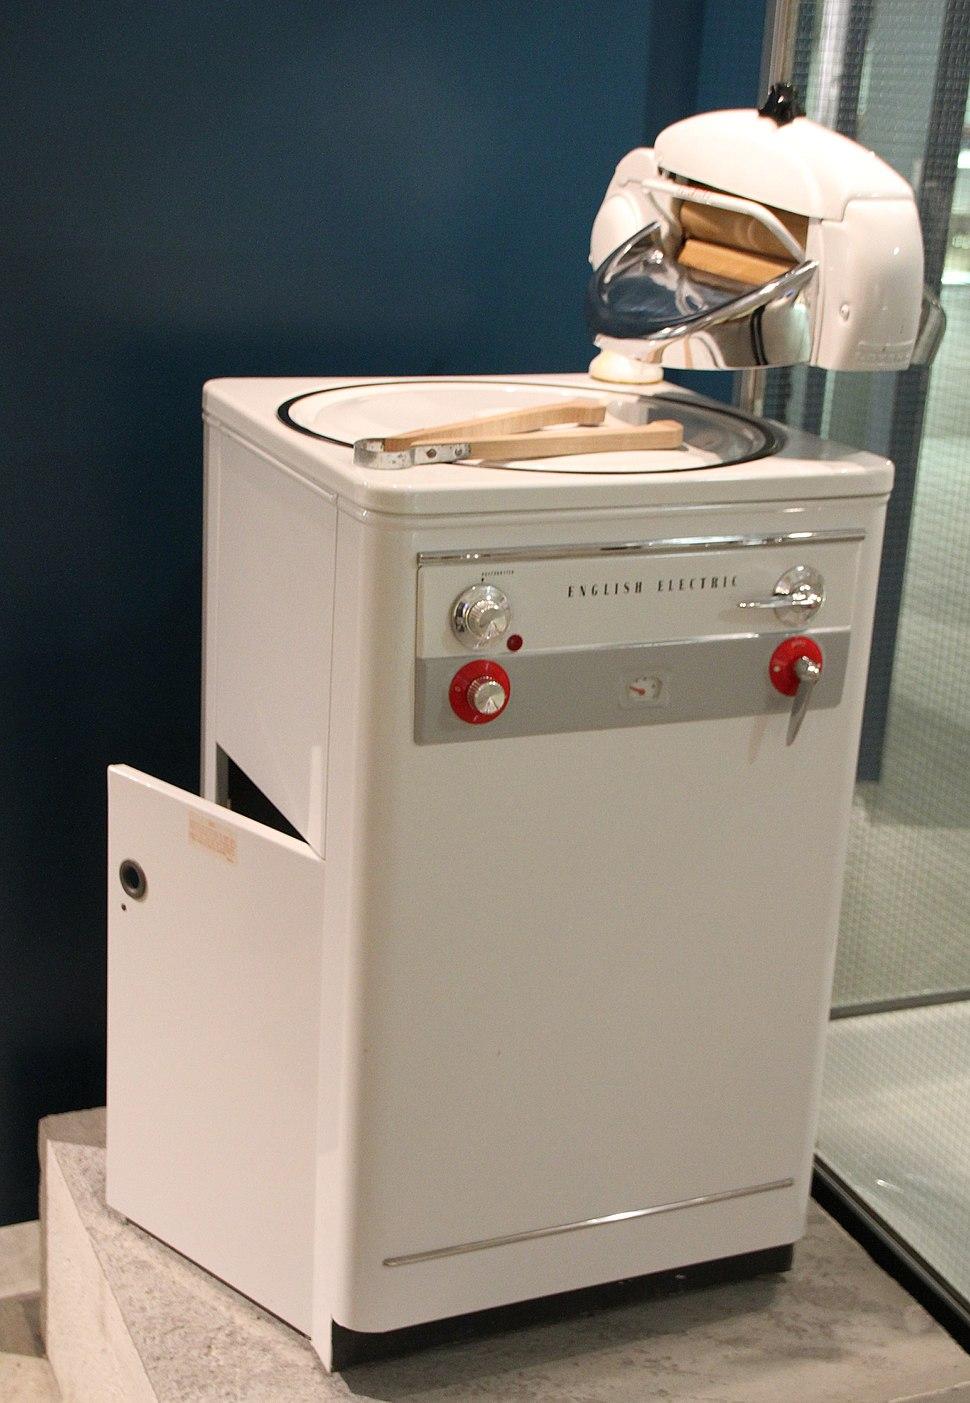 English Electric wash machine 1964 IMG 9474